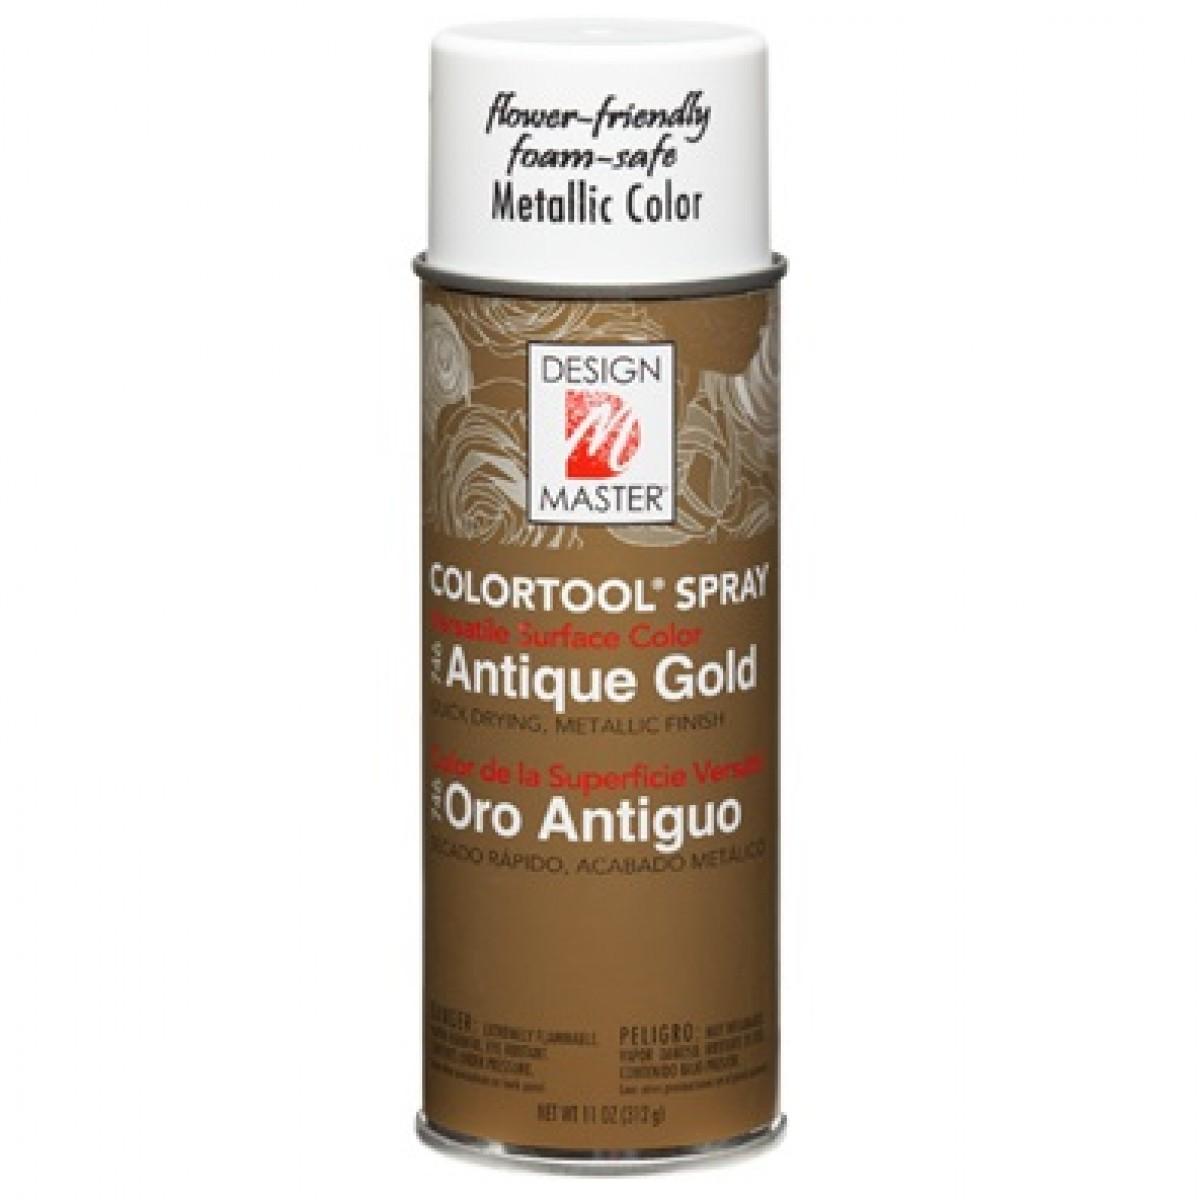 746 Antique Gold DM Colour Tool Metal Spray Paint - 1 No